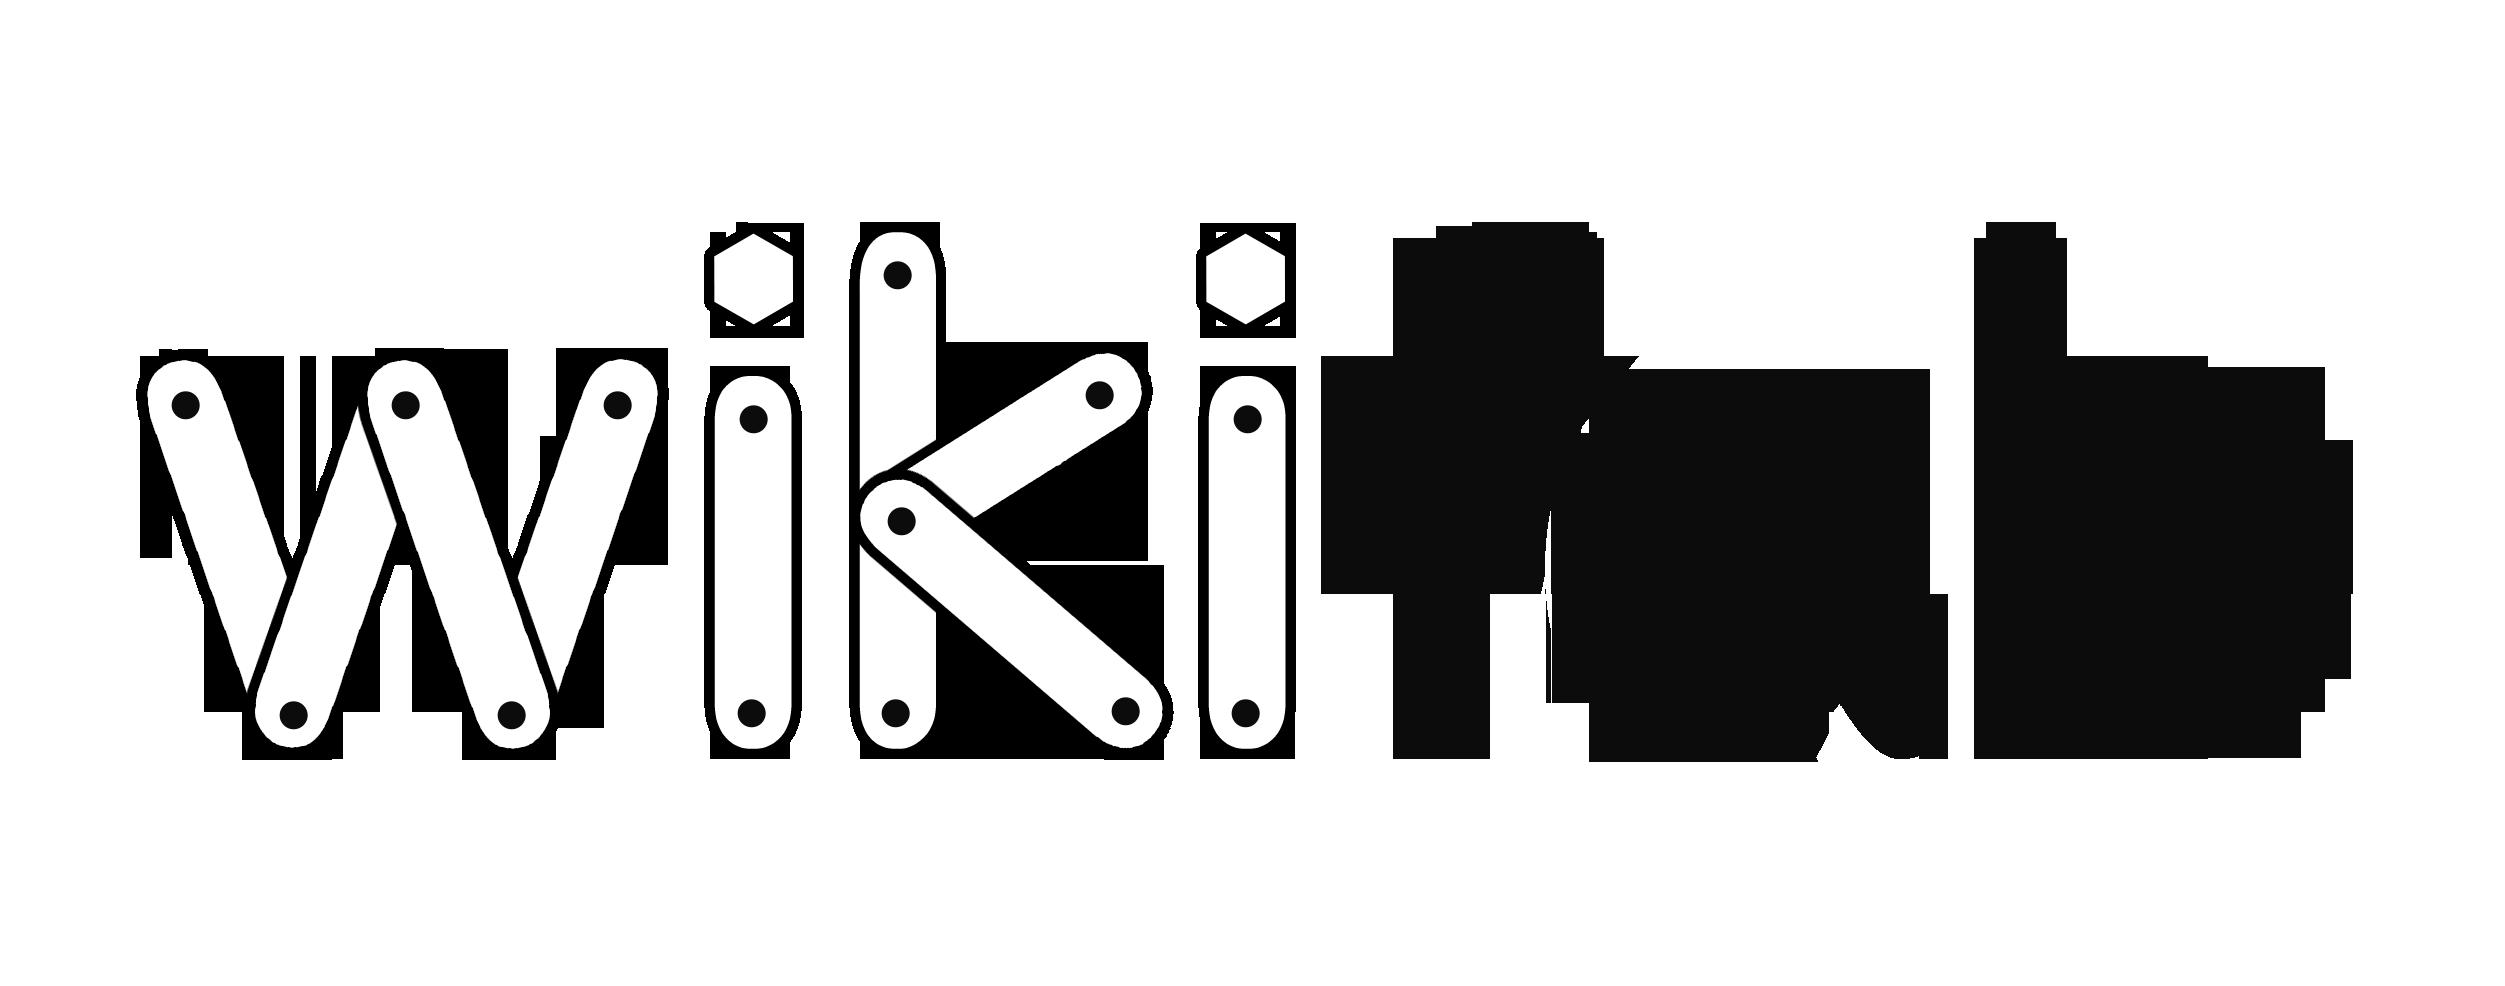 Test_cr_ation_d_un_tutoriel_Logo_Wikifab_HD_NoBackground.png